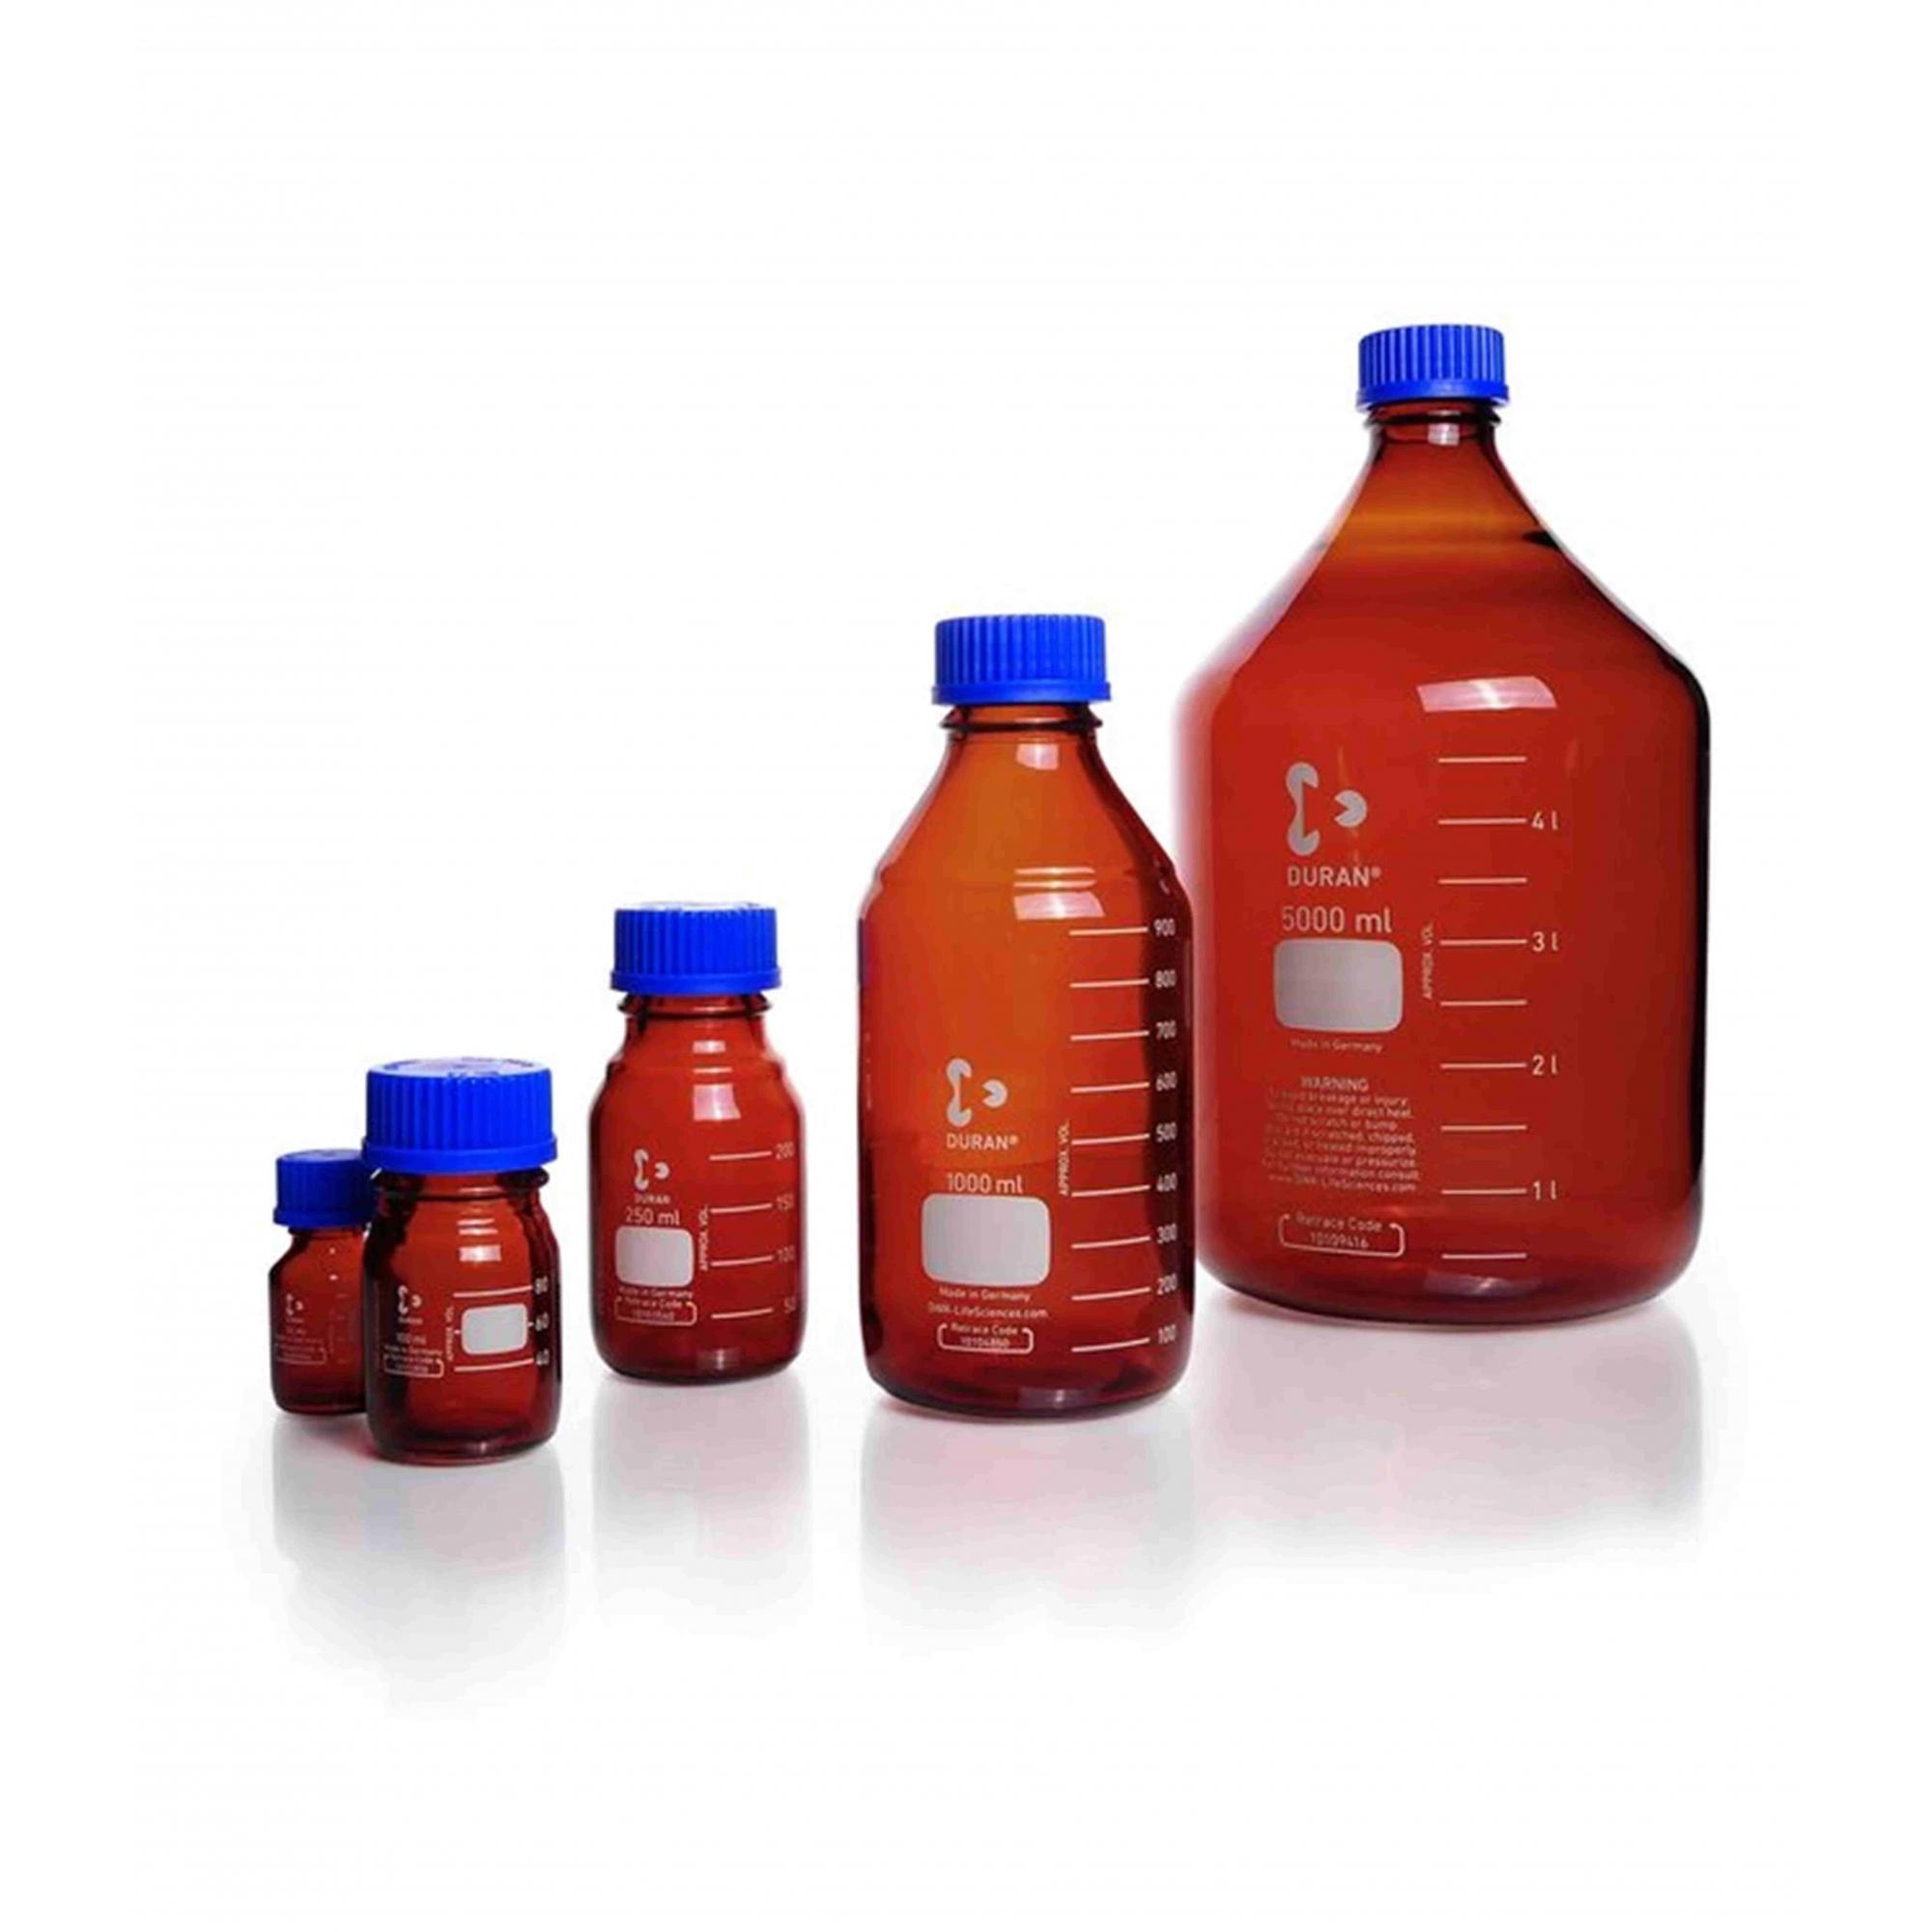 Frasco Reagente Âmbar Tampa Azul 100 ml - Schott - Cód. 21806245